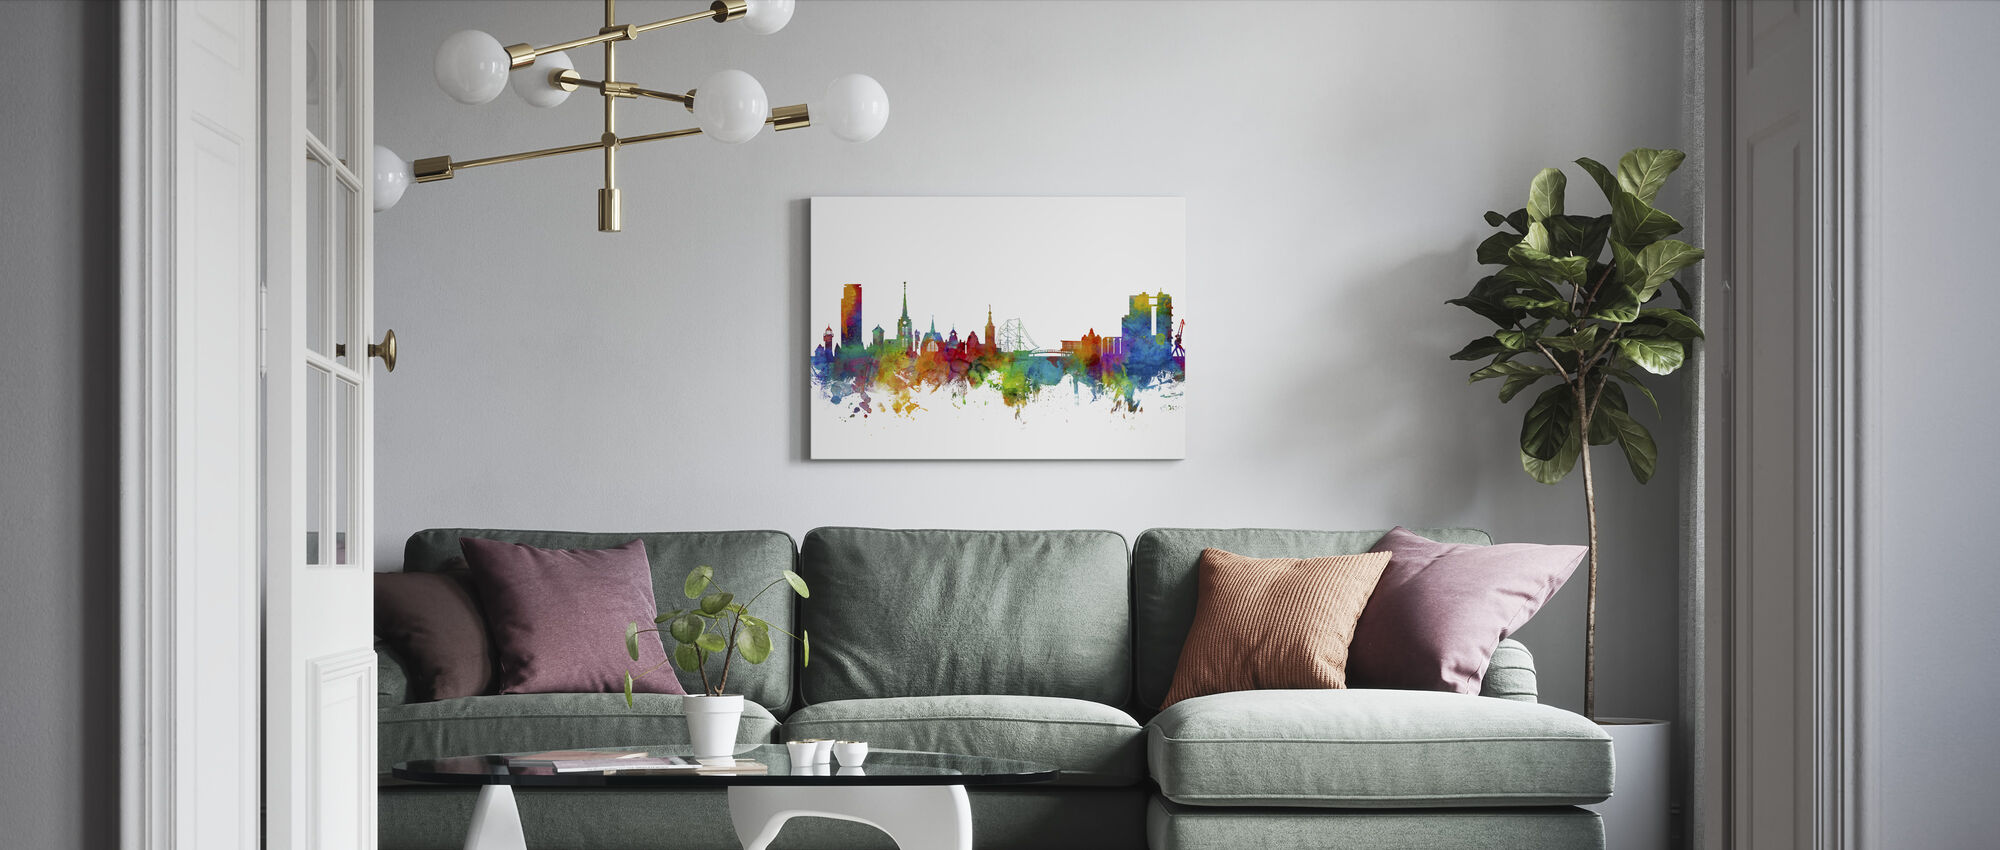 Halmstad Skyline - Canvastavla - Vardagsrum